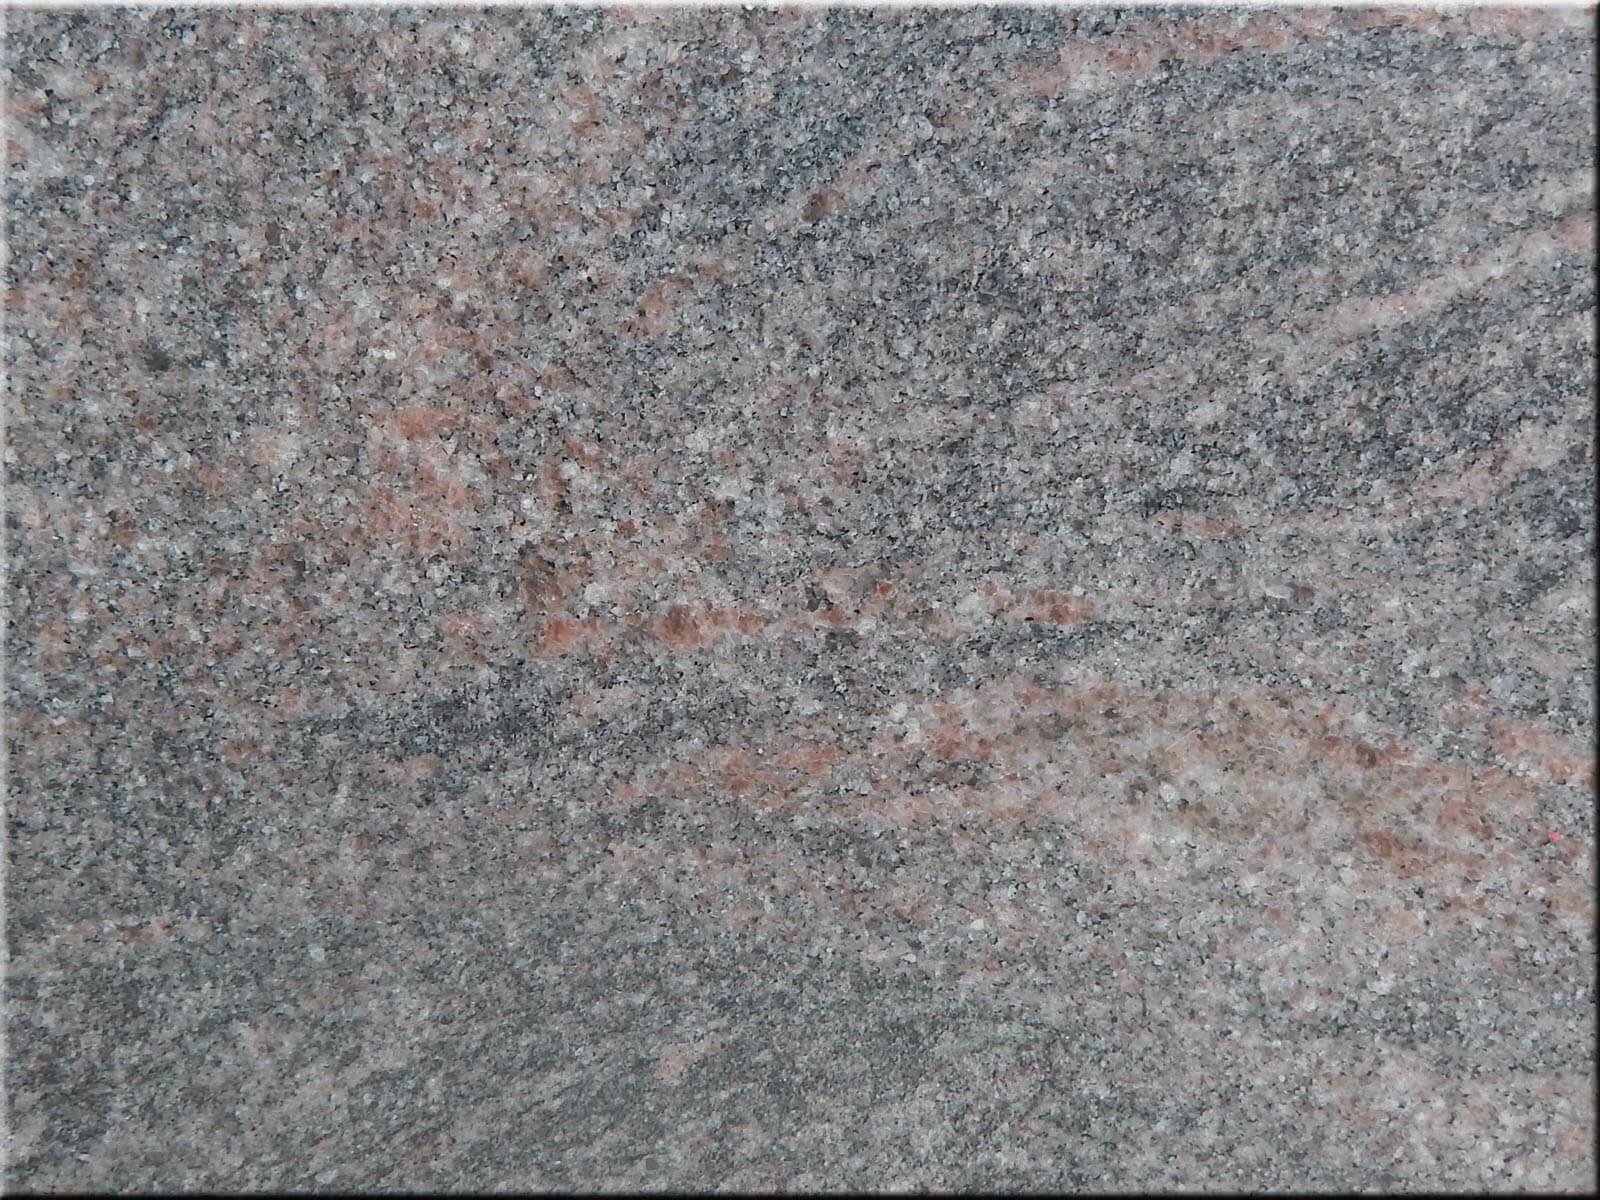 23 Stunning Granite Cemetery Vases Suppliers 2021 free download granite cemetery vases suppliers of himalayan blue granite custom memorial granite headstoneoutdoor intended for himalayan blue granite